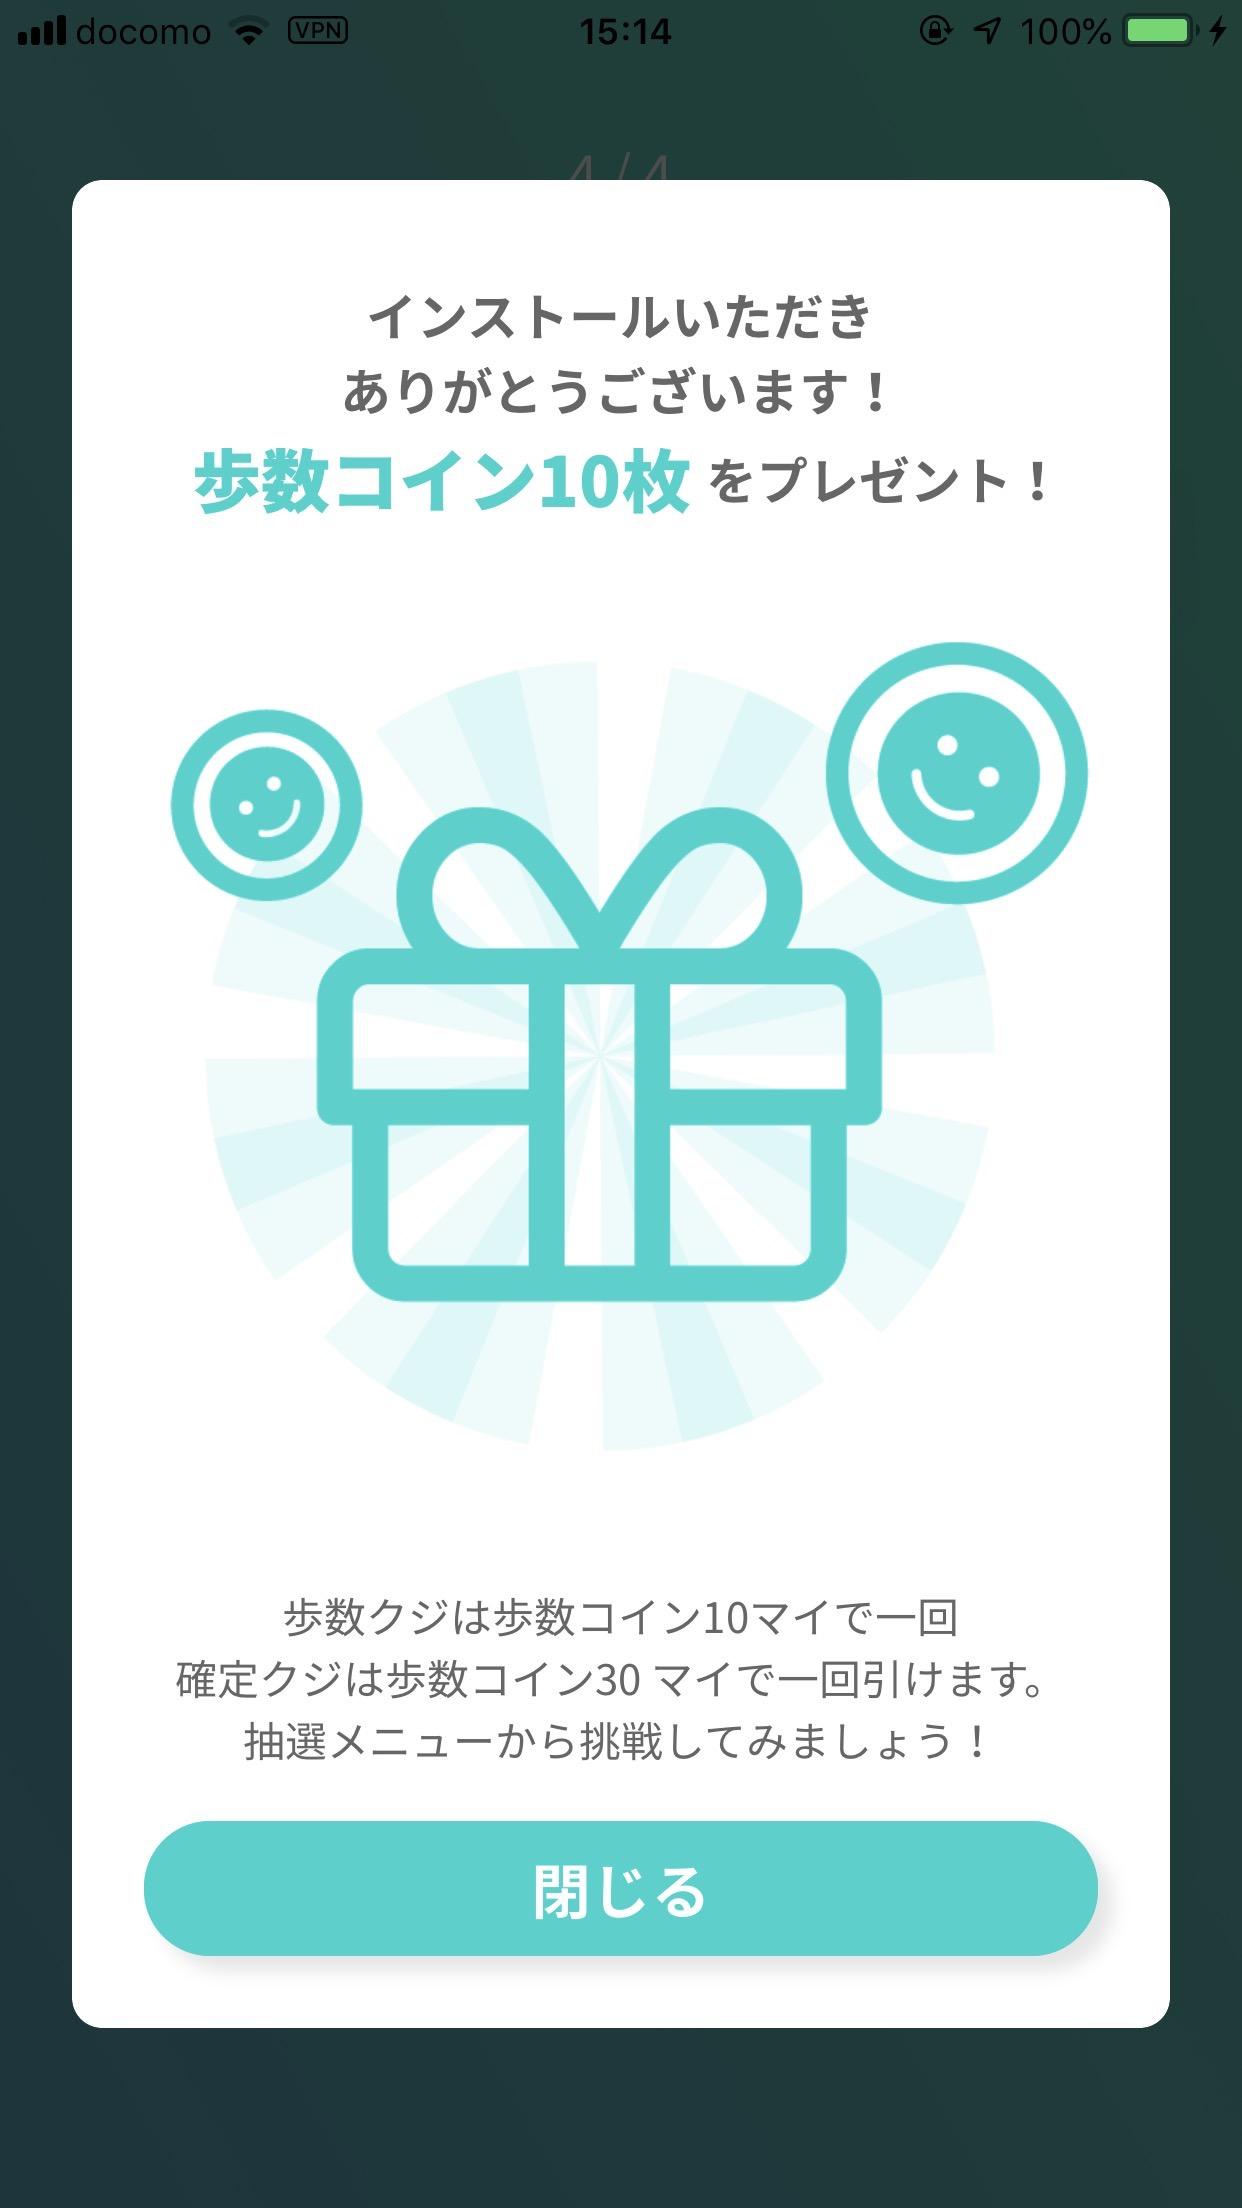 Amazonギフト券が当たる歩数計アプリ「WalkCoin(アルコイン)」